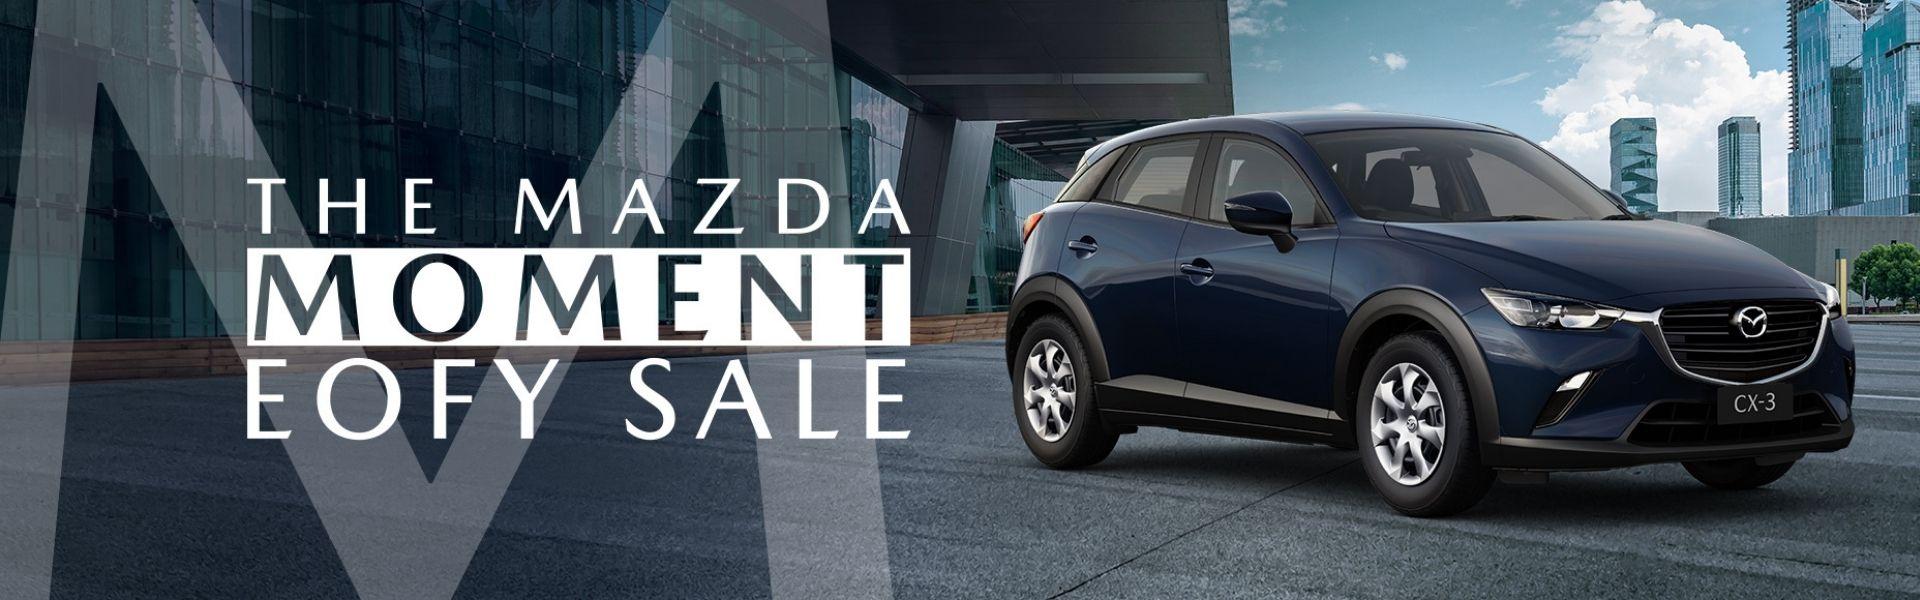 The Mazda Moment EOFY Sale